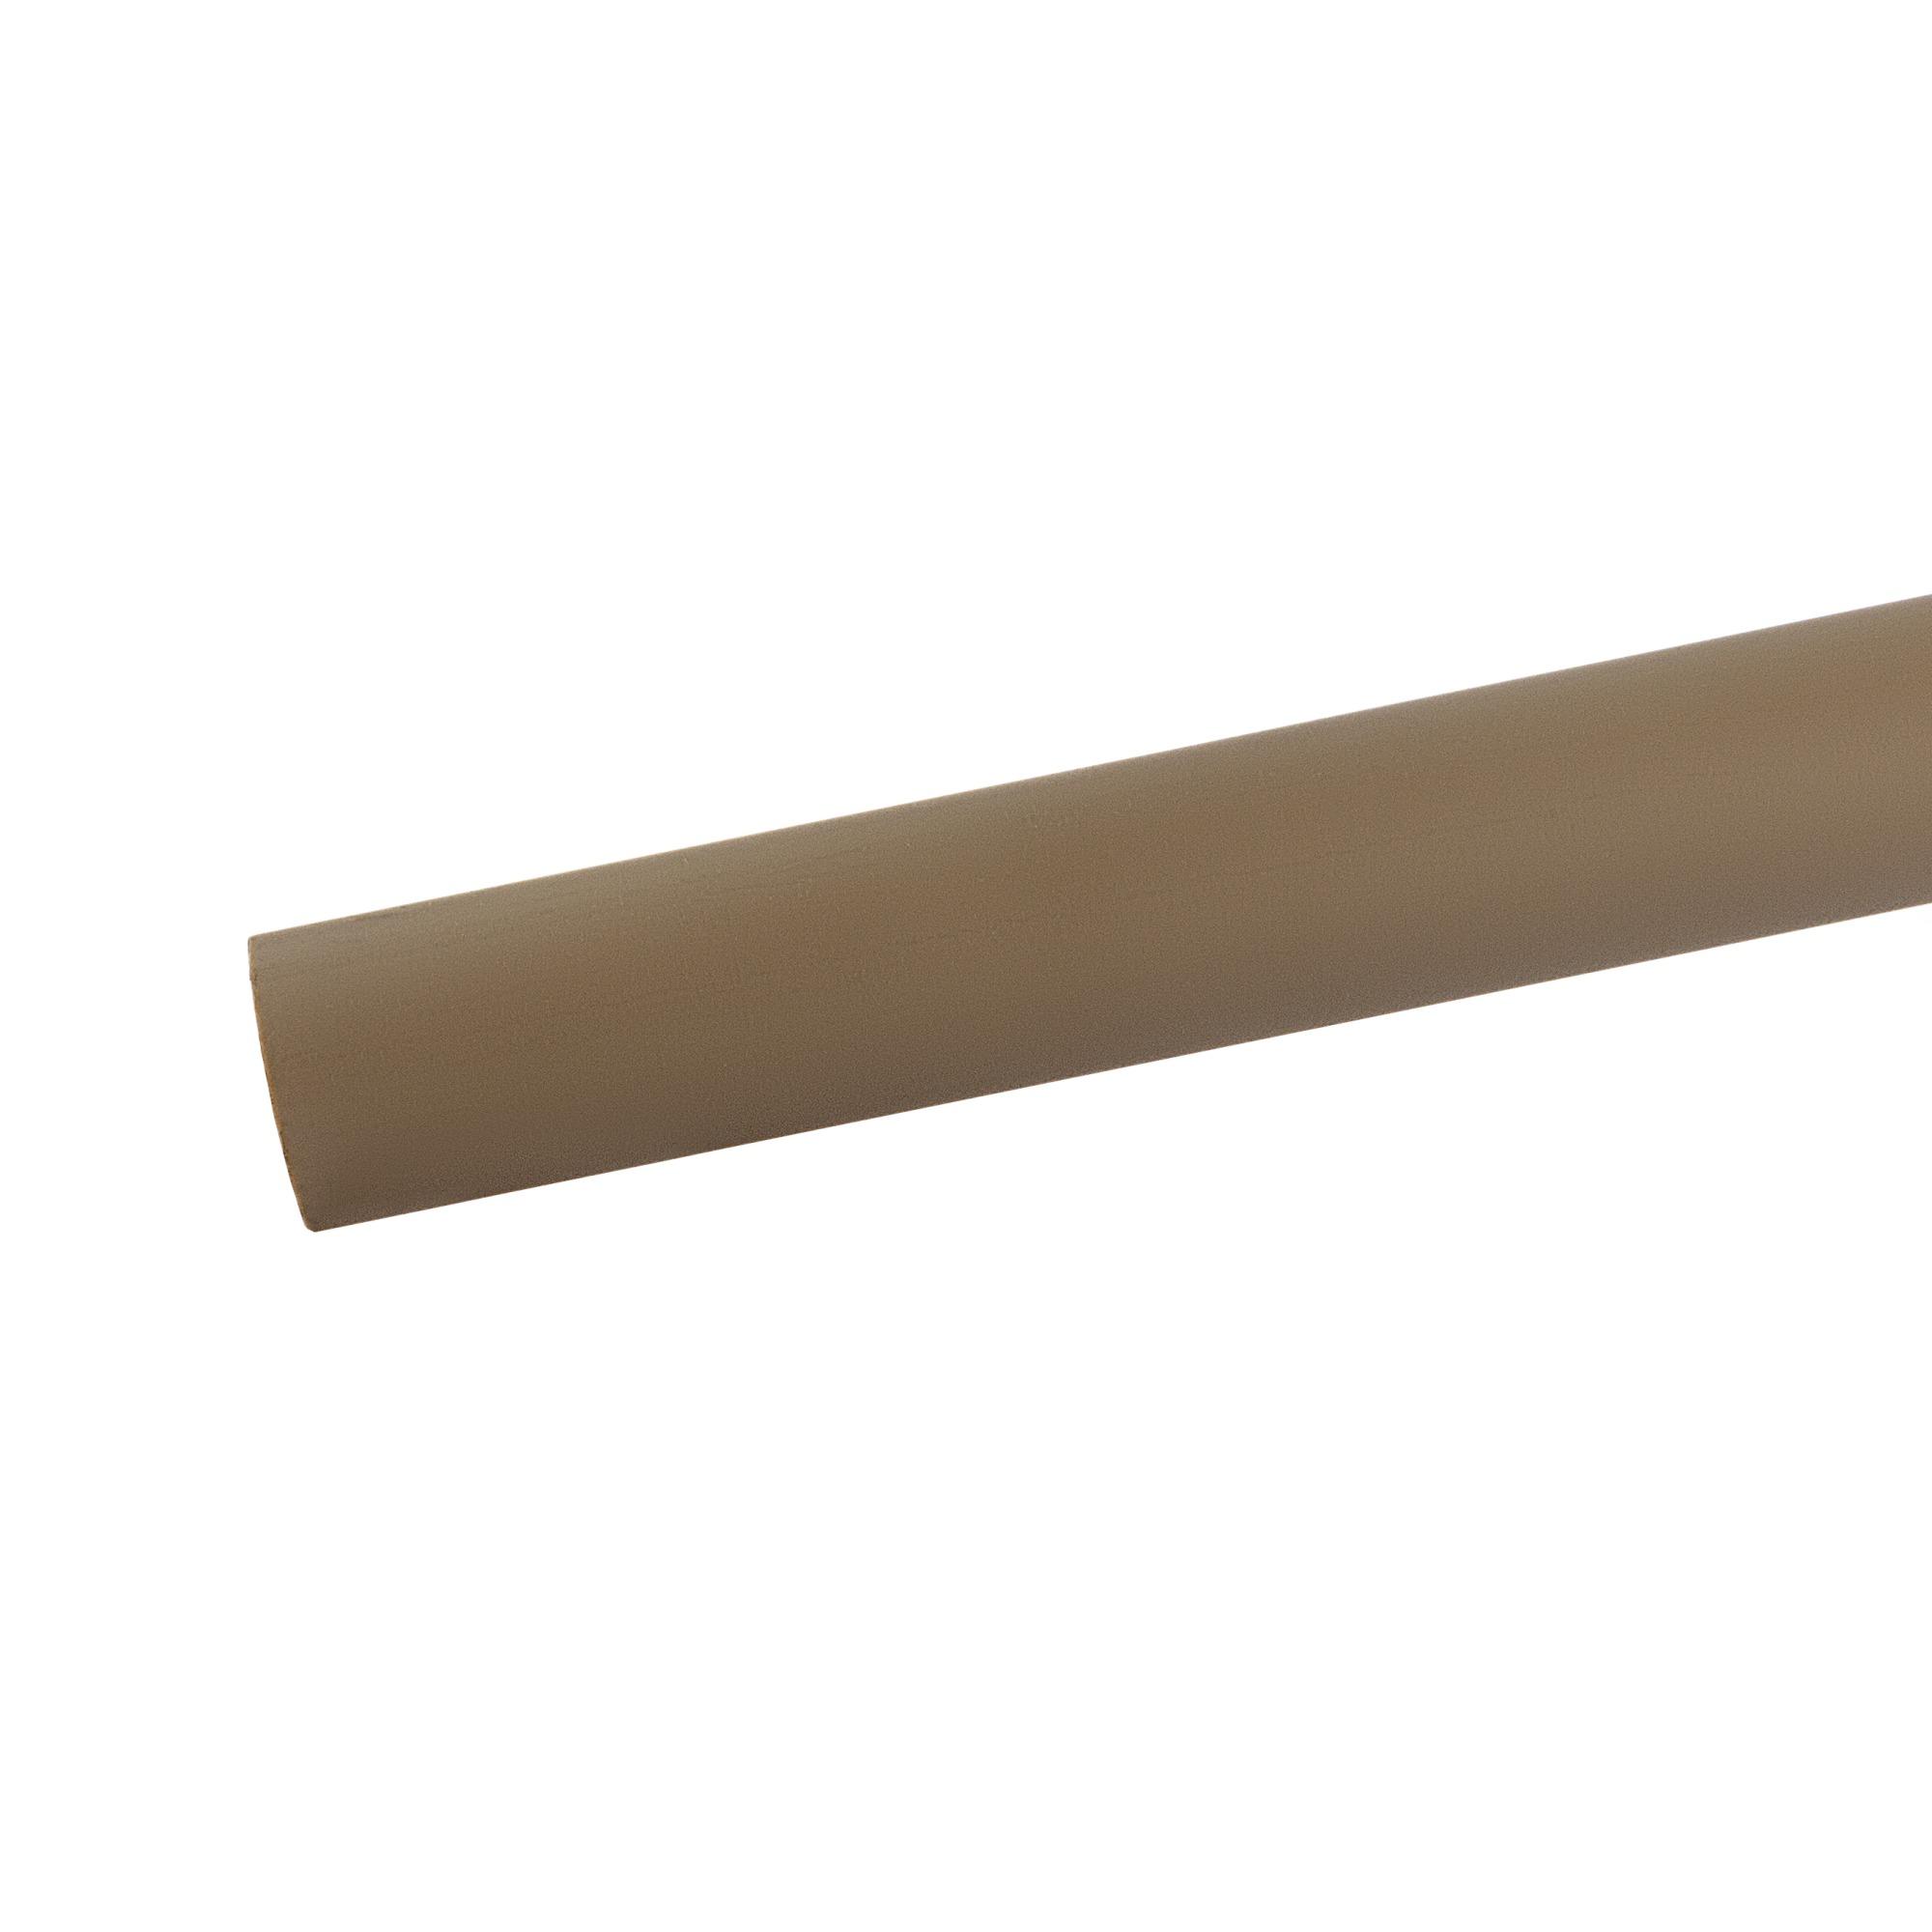 Cano PVC 25 mm x 3 m Soldavel 10088 - Amanco